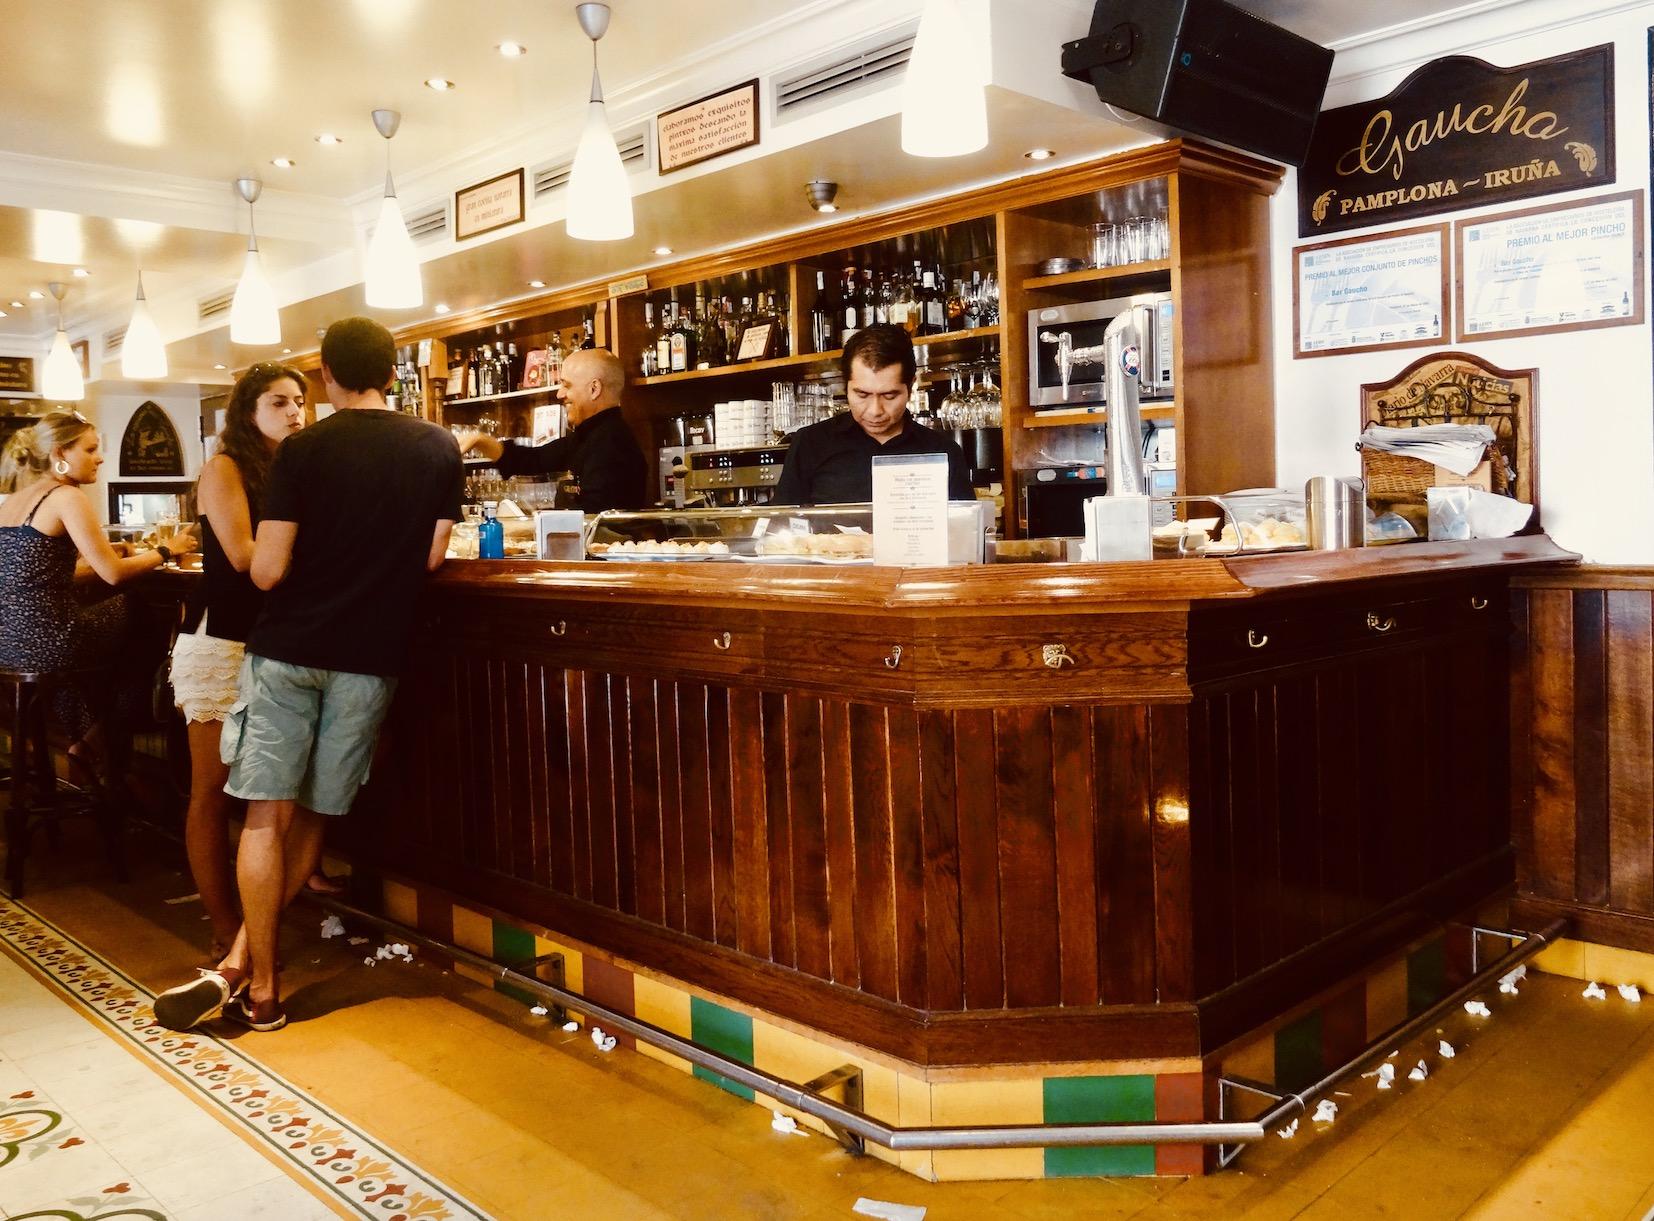 Inside Bar Gaucho Pamplona.